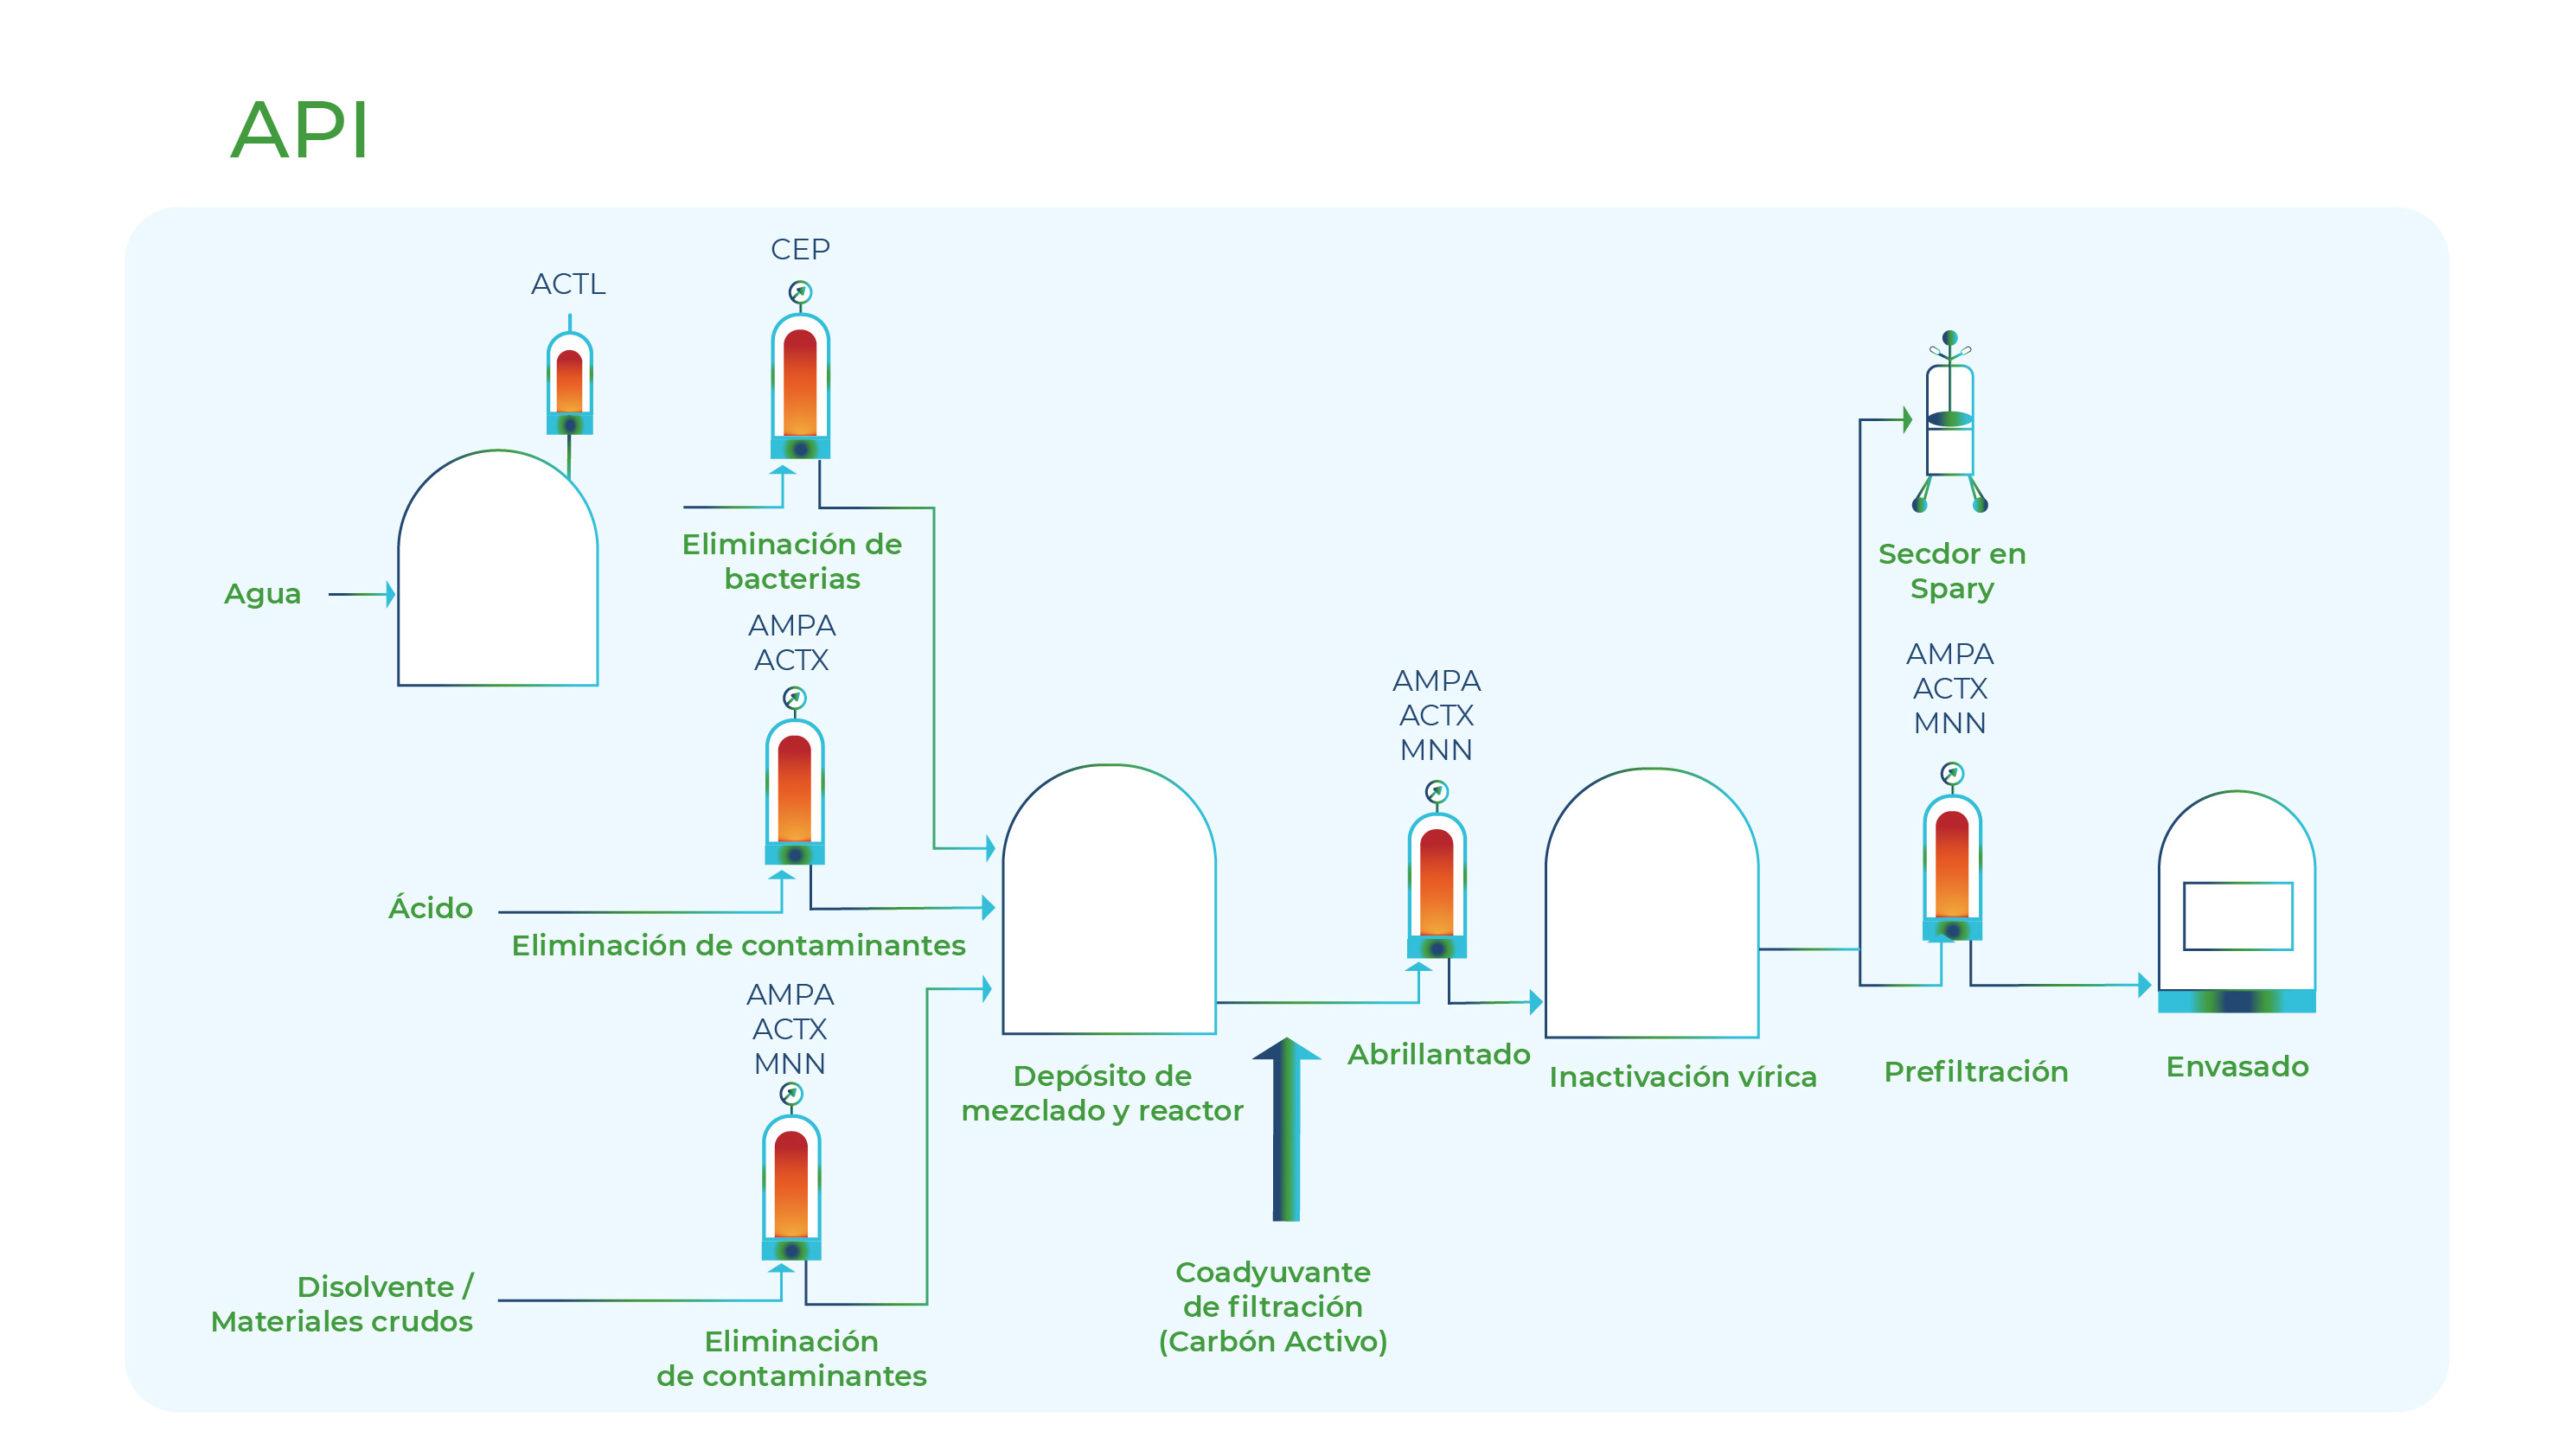 Diagrama API's